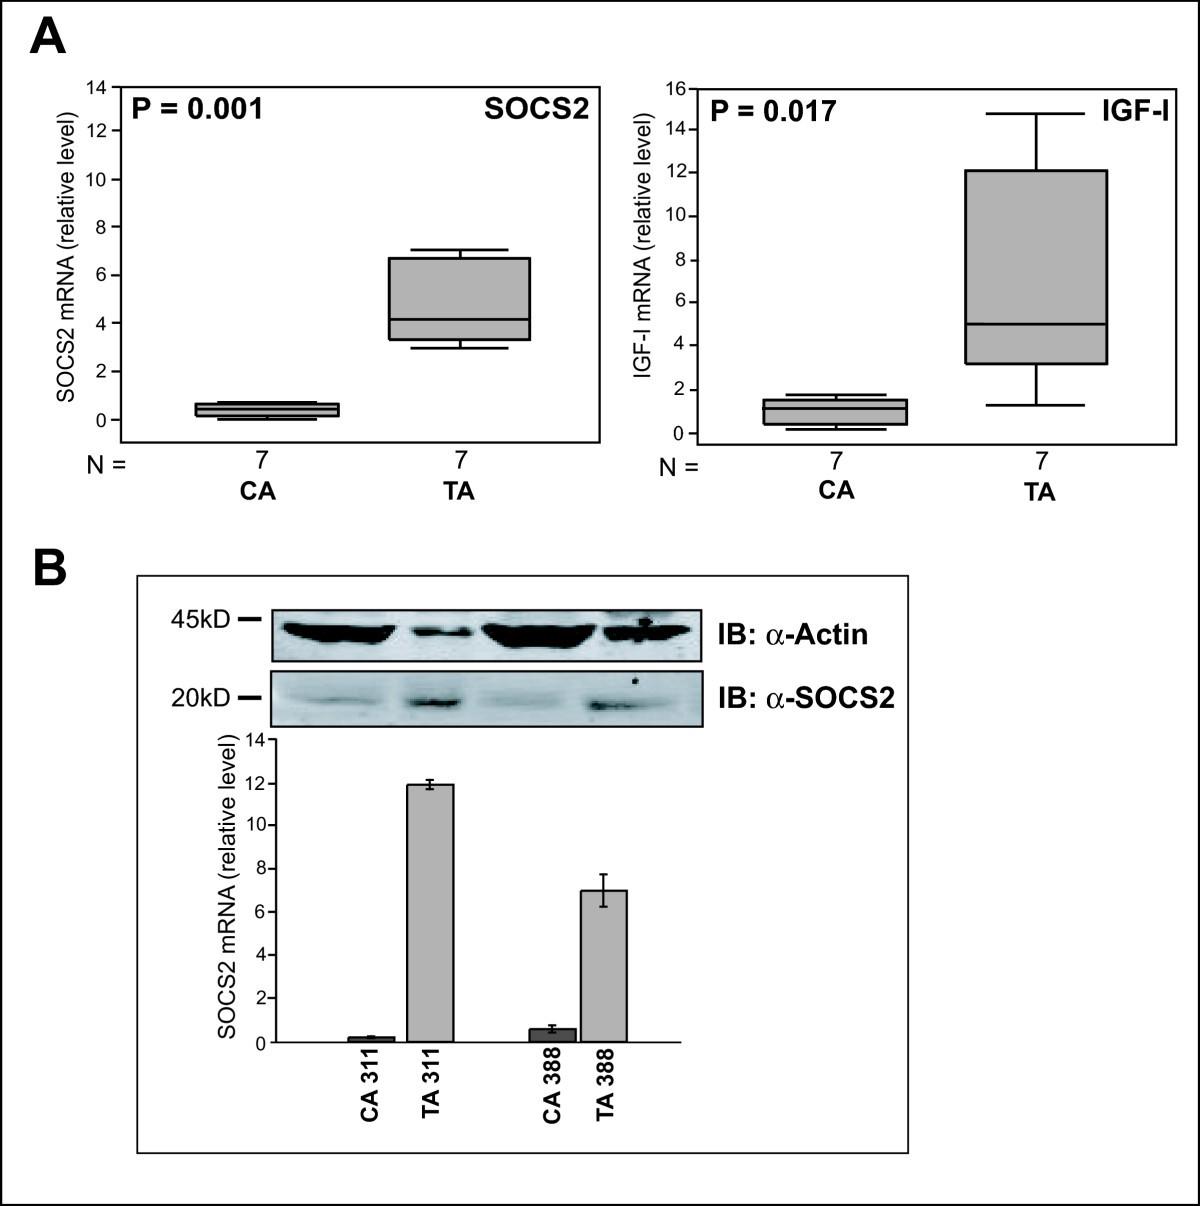 Favorable prognostic value of SOCS2 and IGF-I in breast cancer | BMC